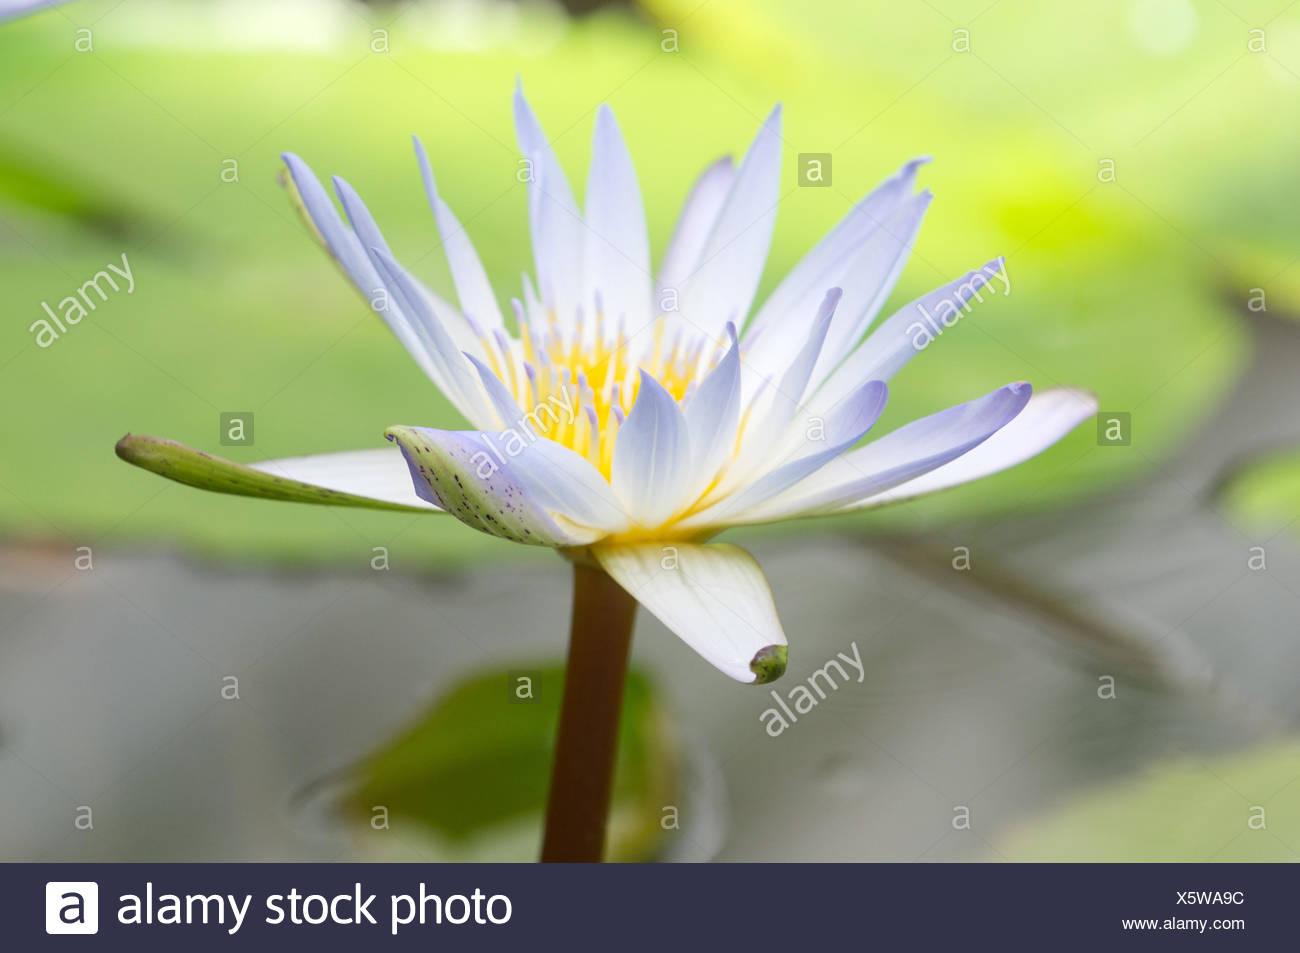 White Egyptian Lotus Blossom Close Up Stock Photo 278996072 Alamy